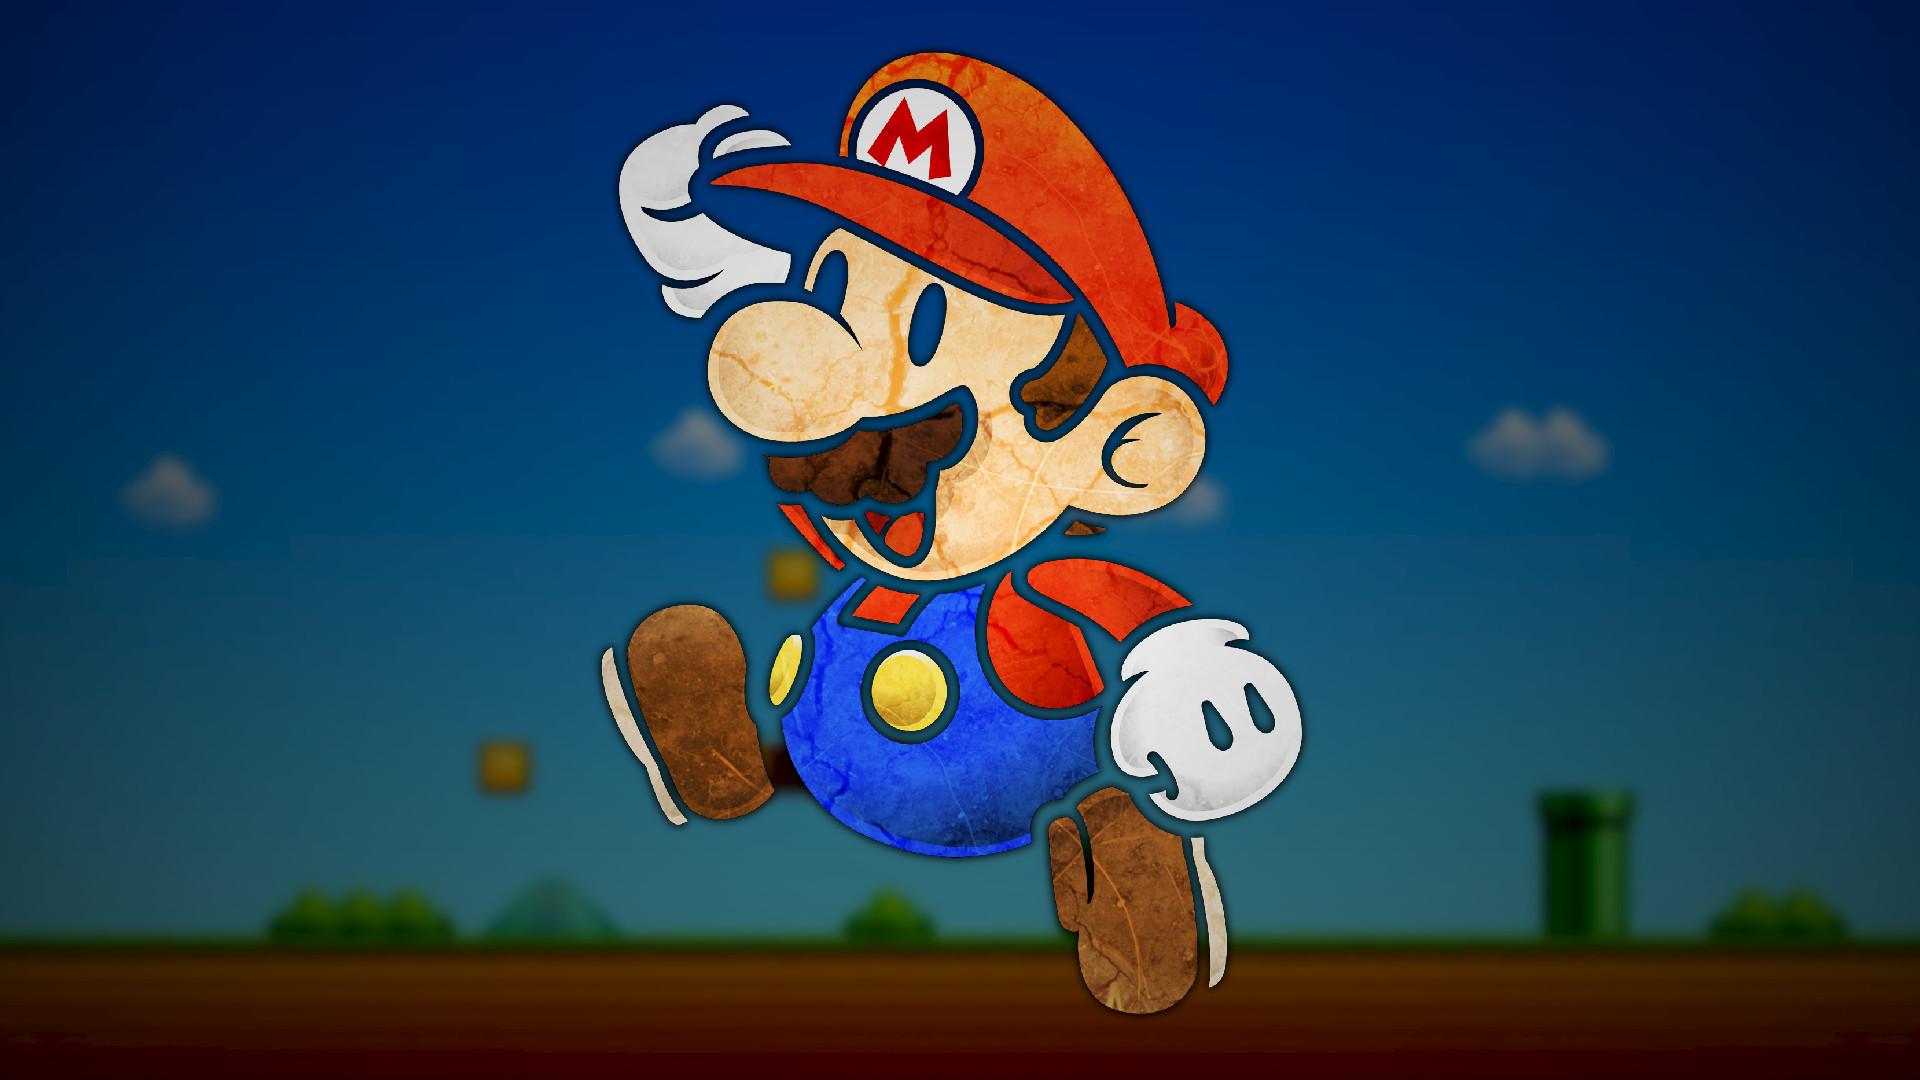 Super Mario, Paper Mario, Video Games, Digital Art, Nintendo .